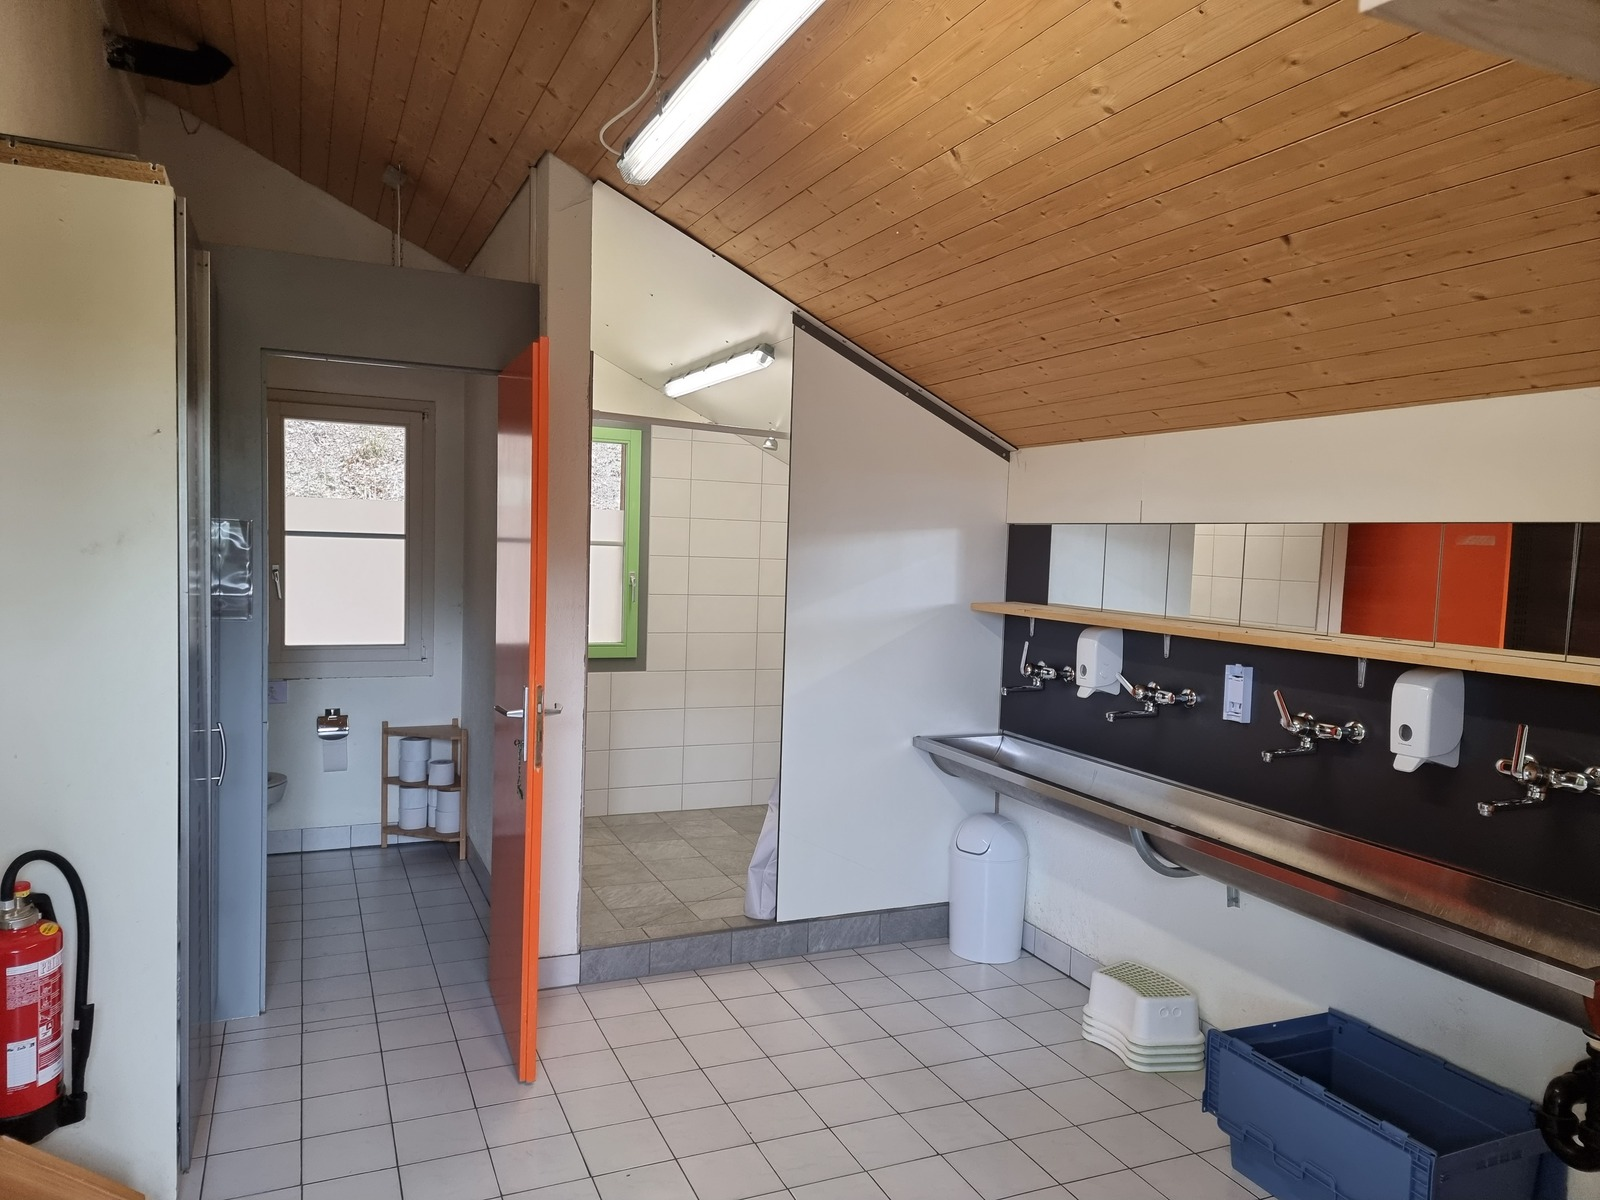 Pfadiheim Waldegg, 3400 Burgdorf - 9507 - WC / Dusche OG